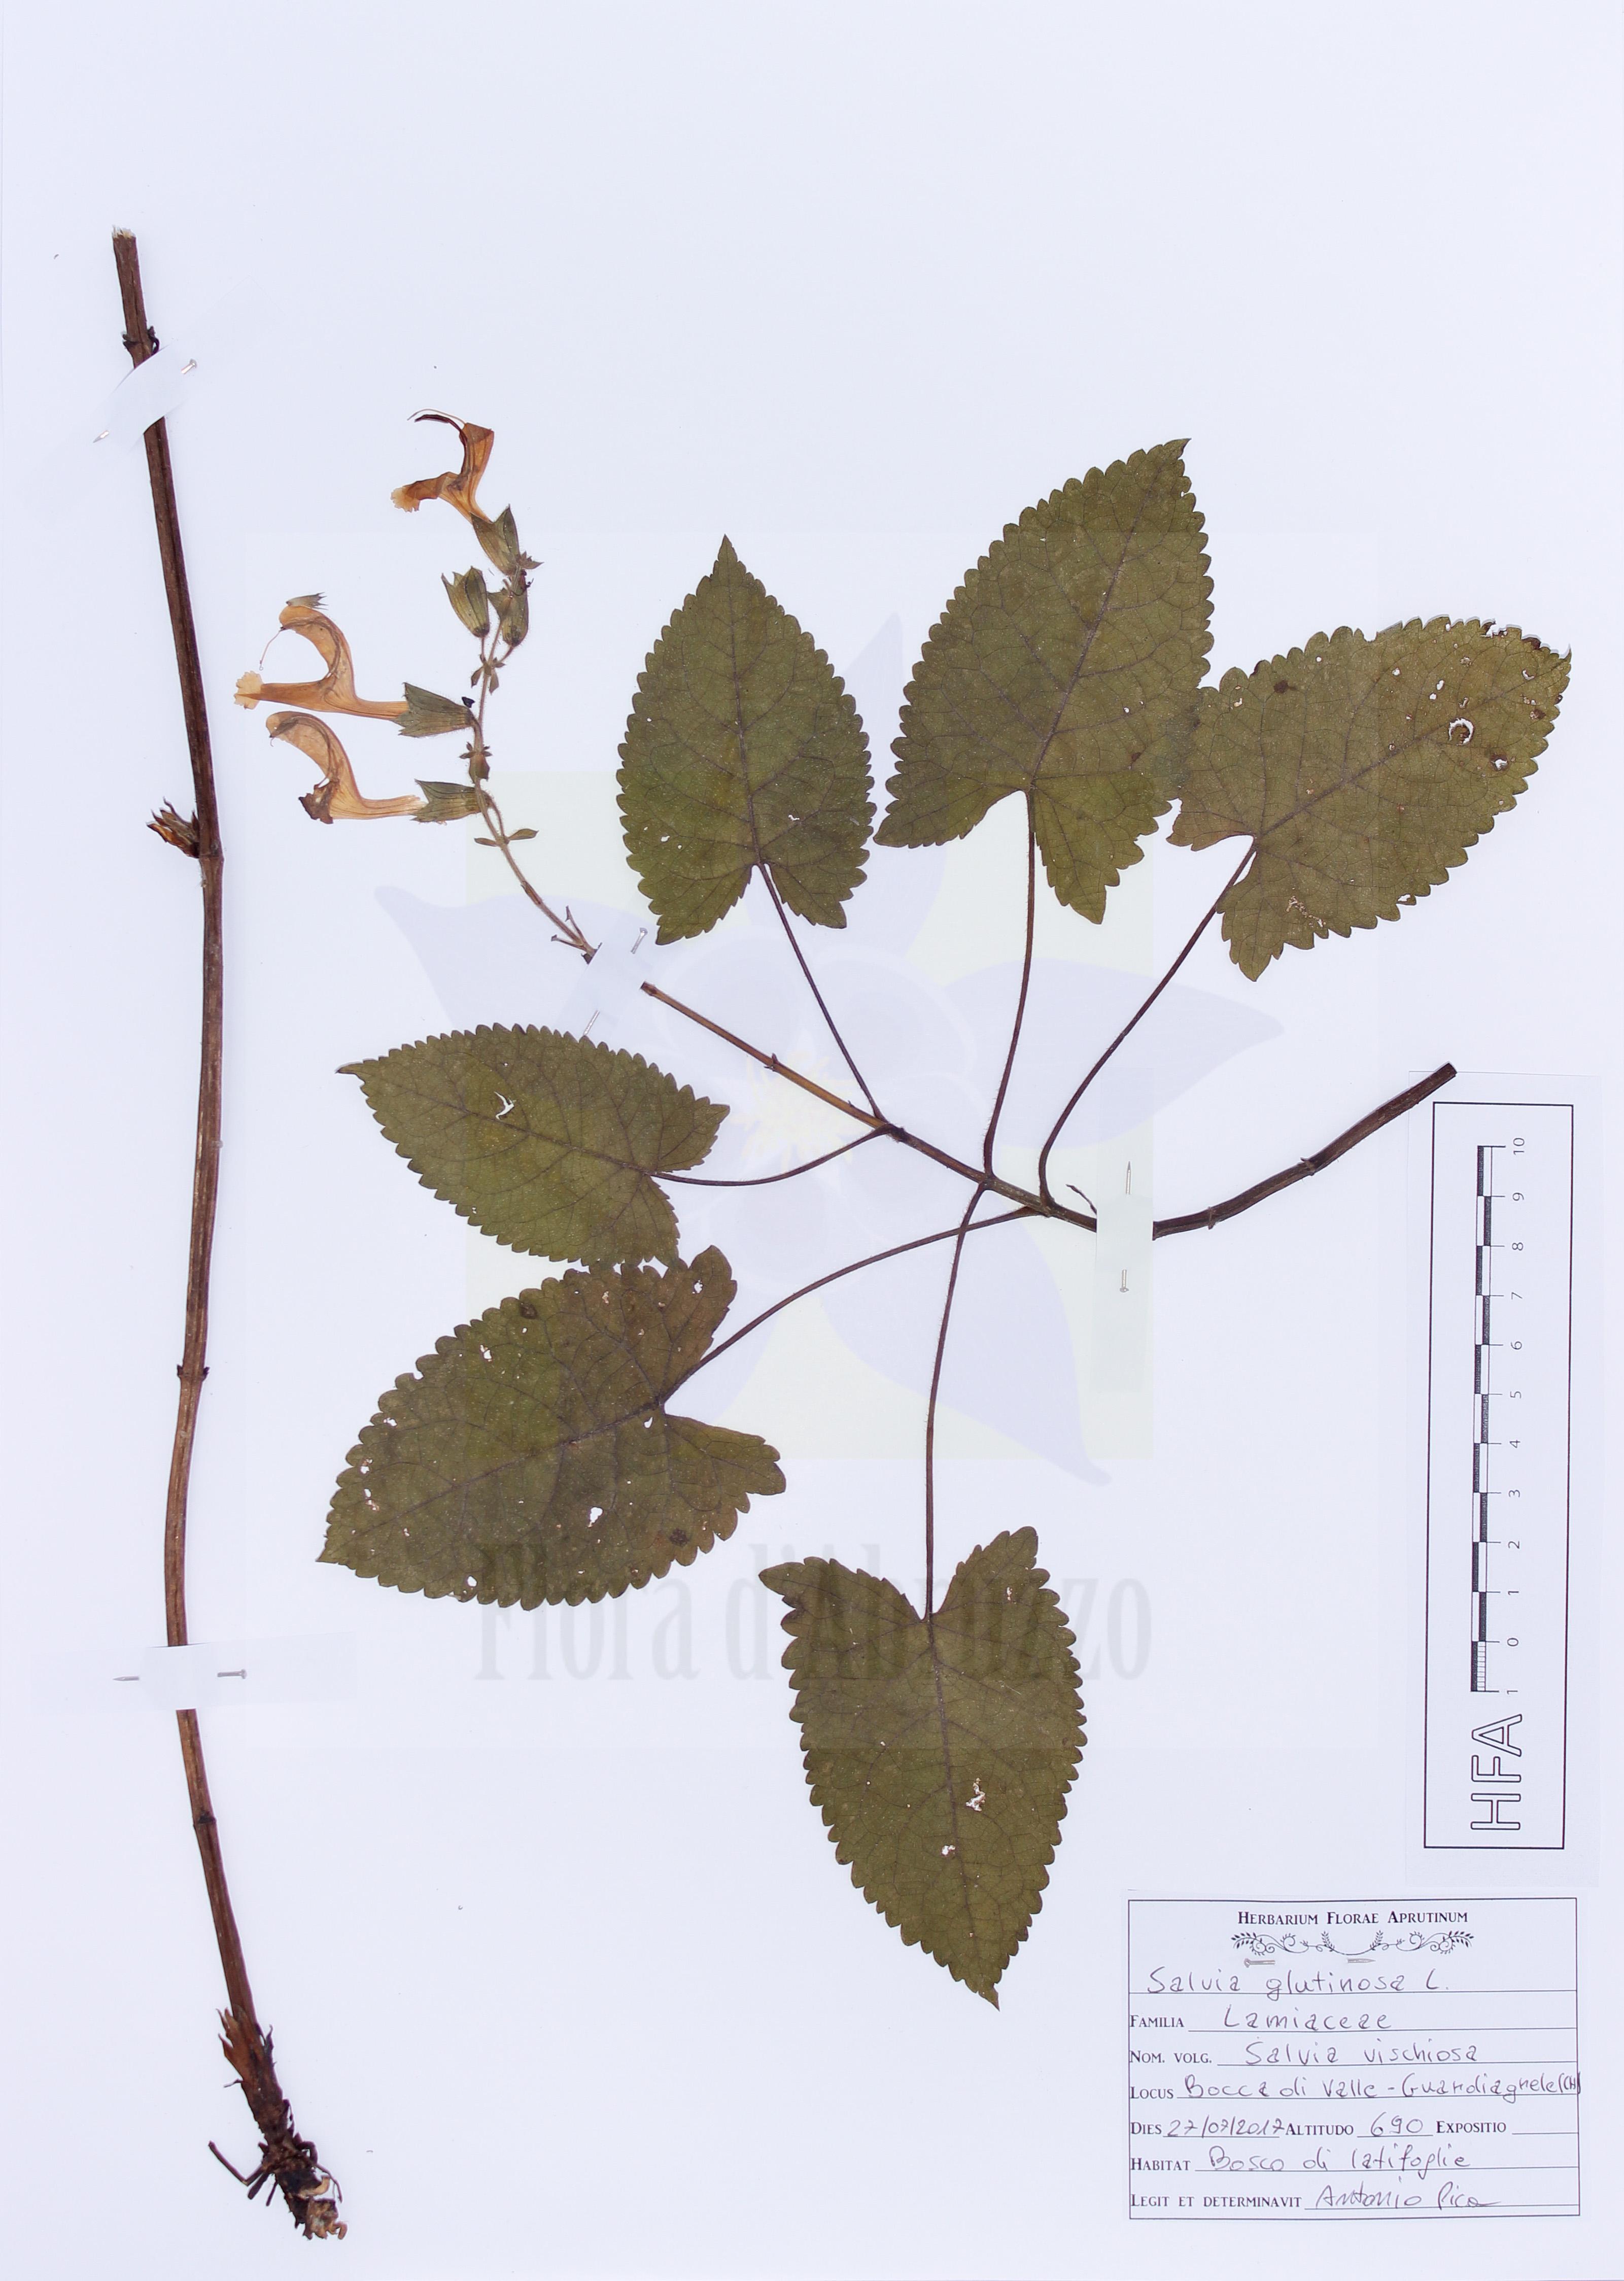 Salvia glutinosa L.